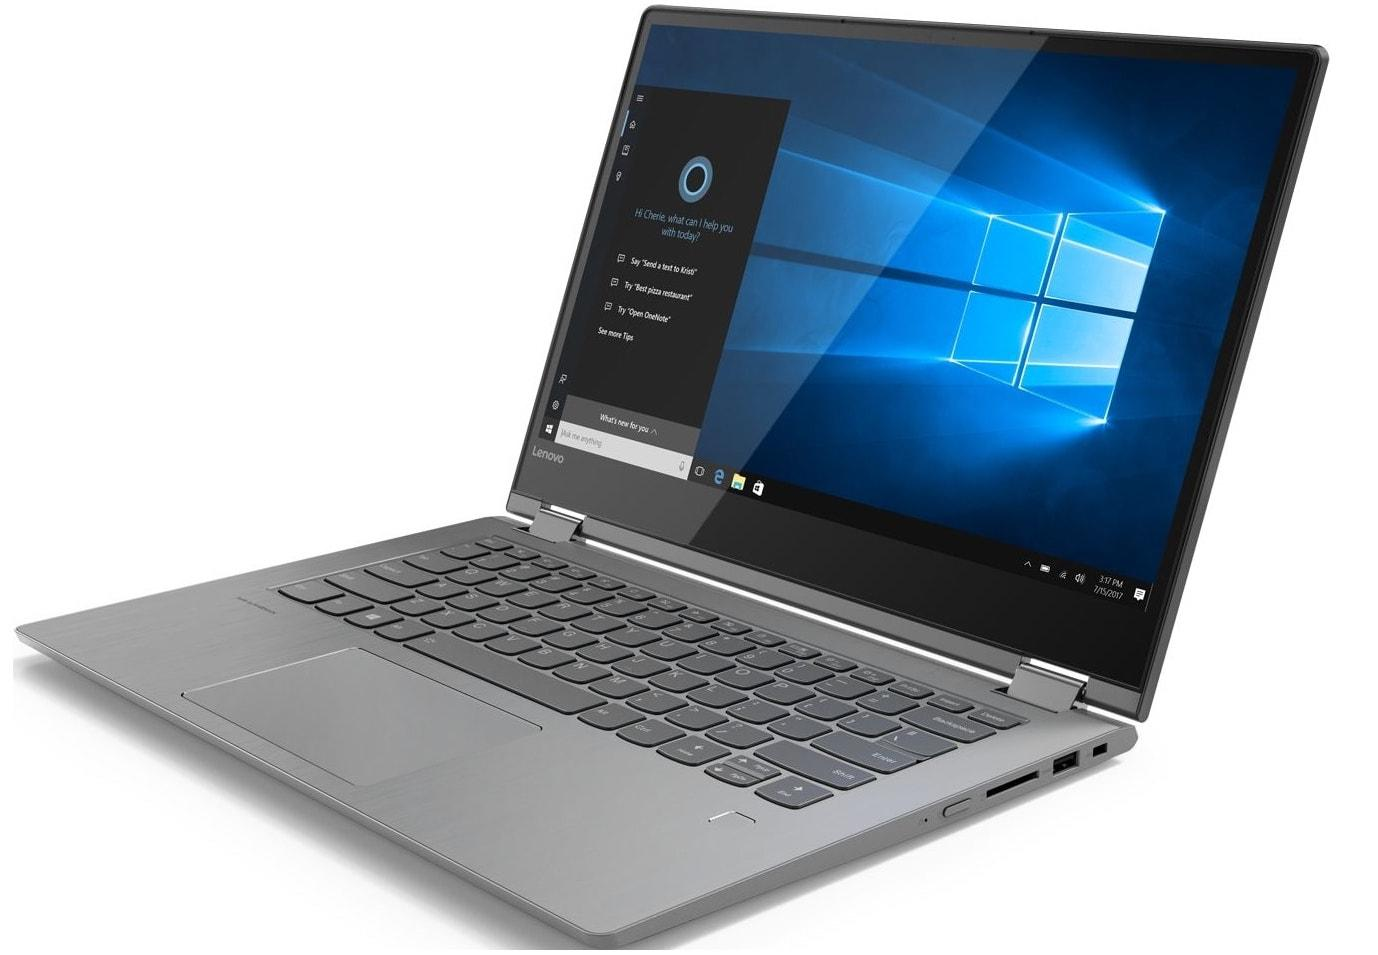 Ordinateur portable Lenovo Yoga 530-14ARR (81H9002SFR) Noir - Ryzen 5, SSD 512 Go - photo 5